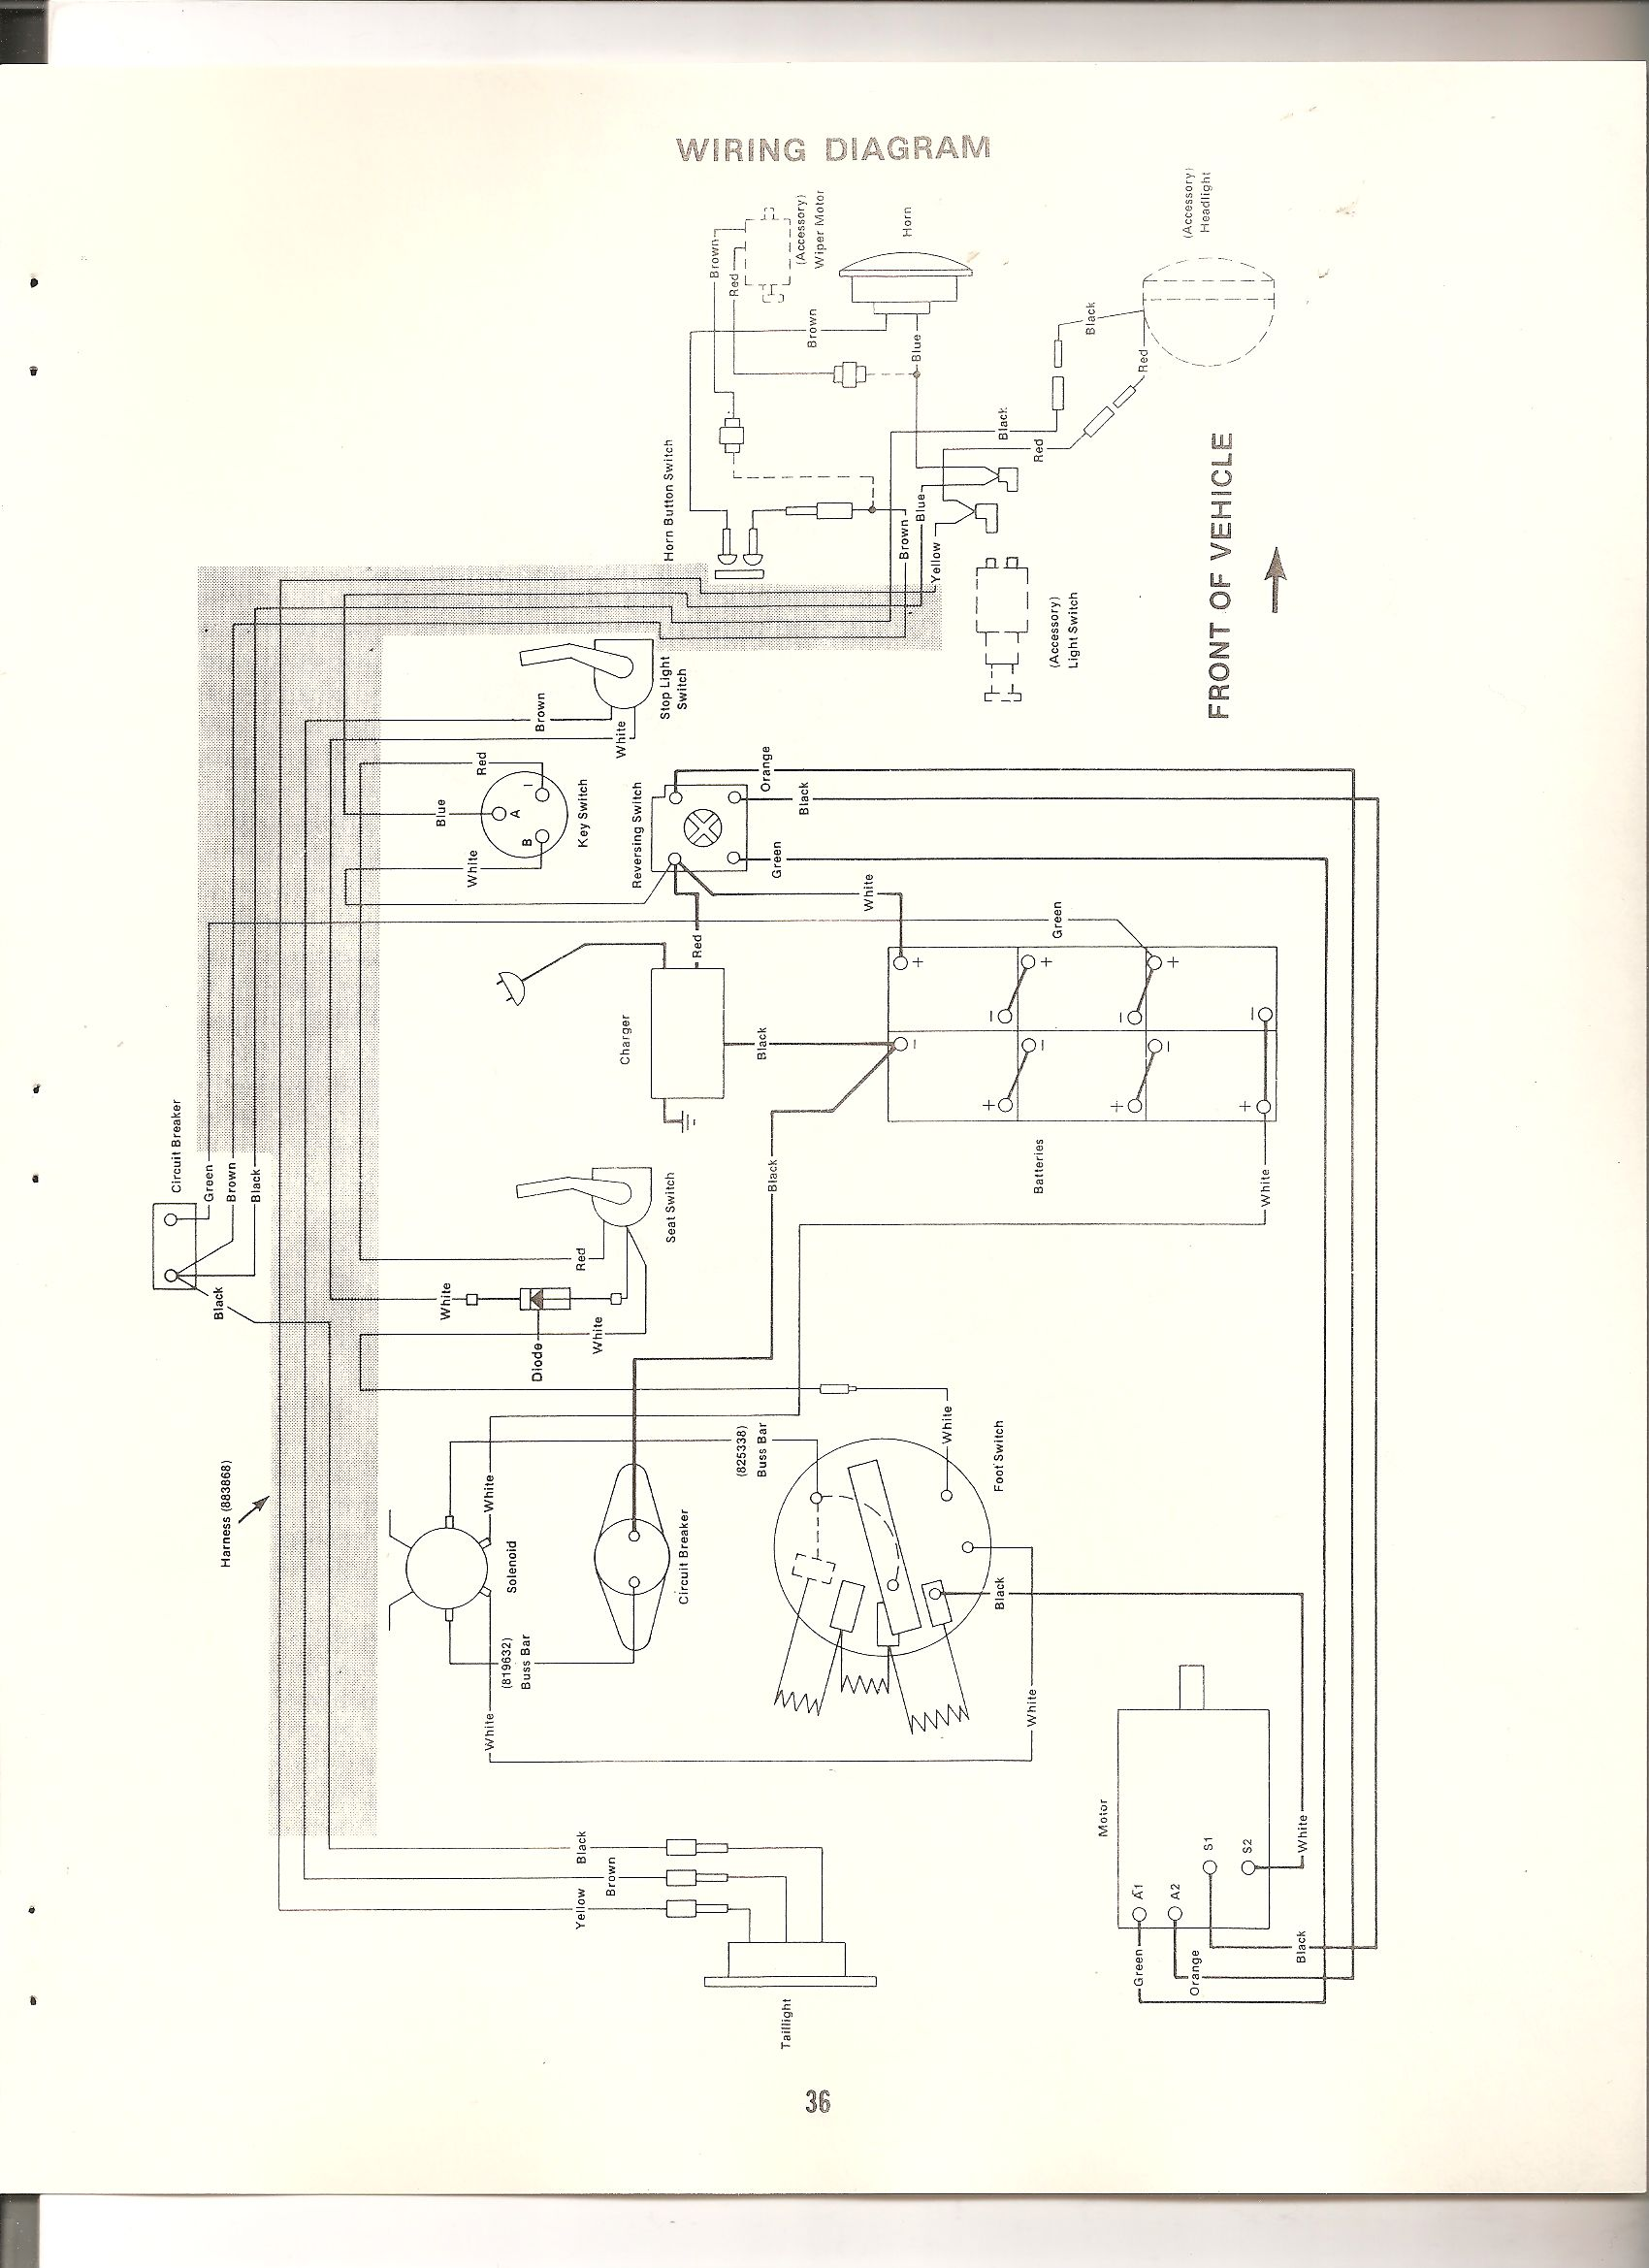 cushman wiring diagram buggy diy wiring diagrams u2022 rh dancesalsa co